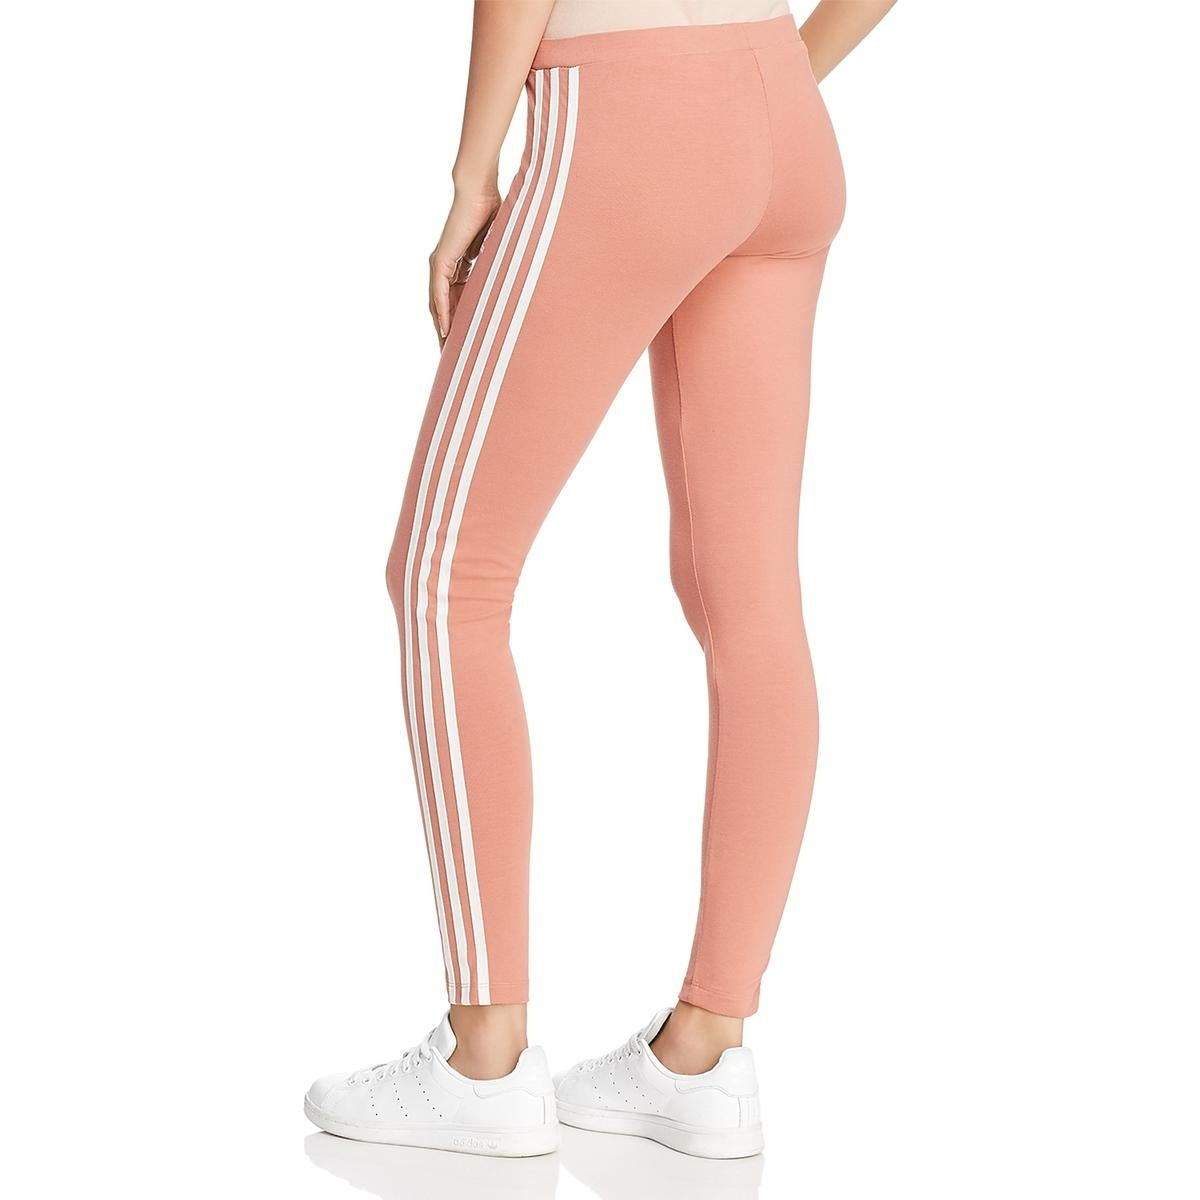 adidas leggings peach